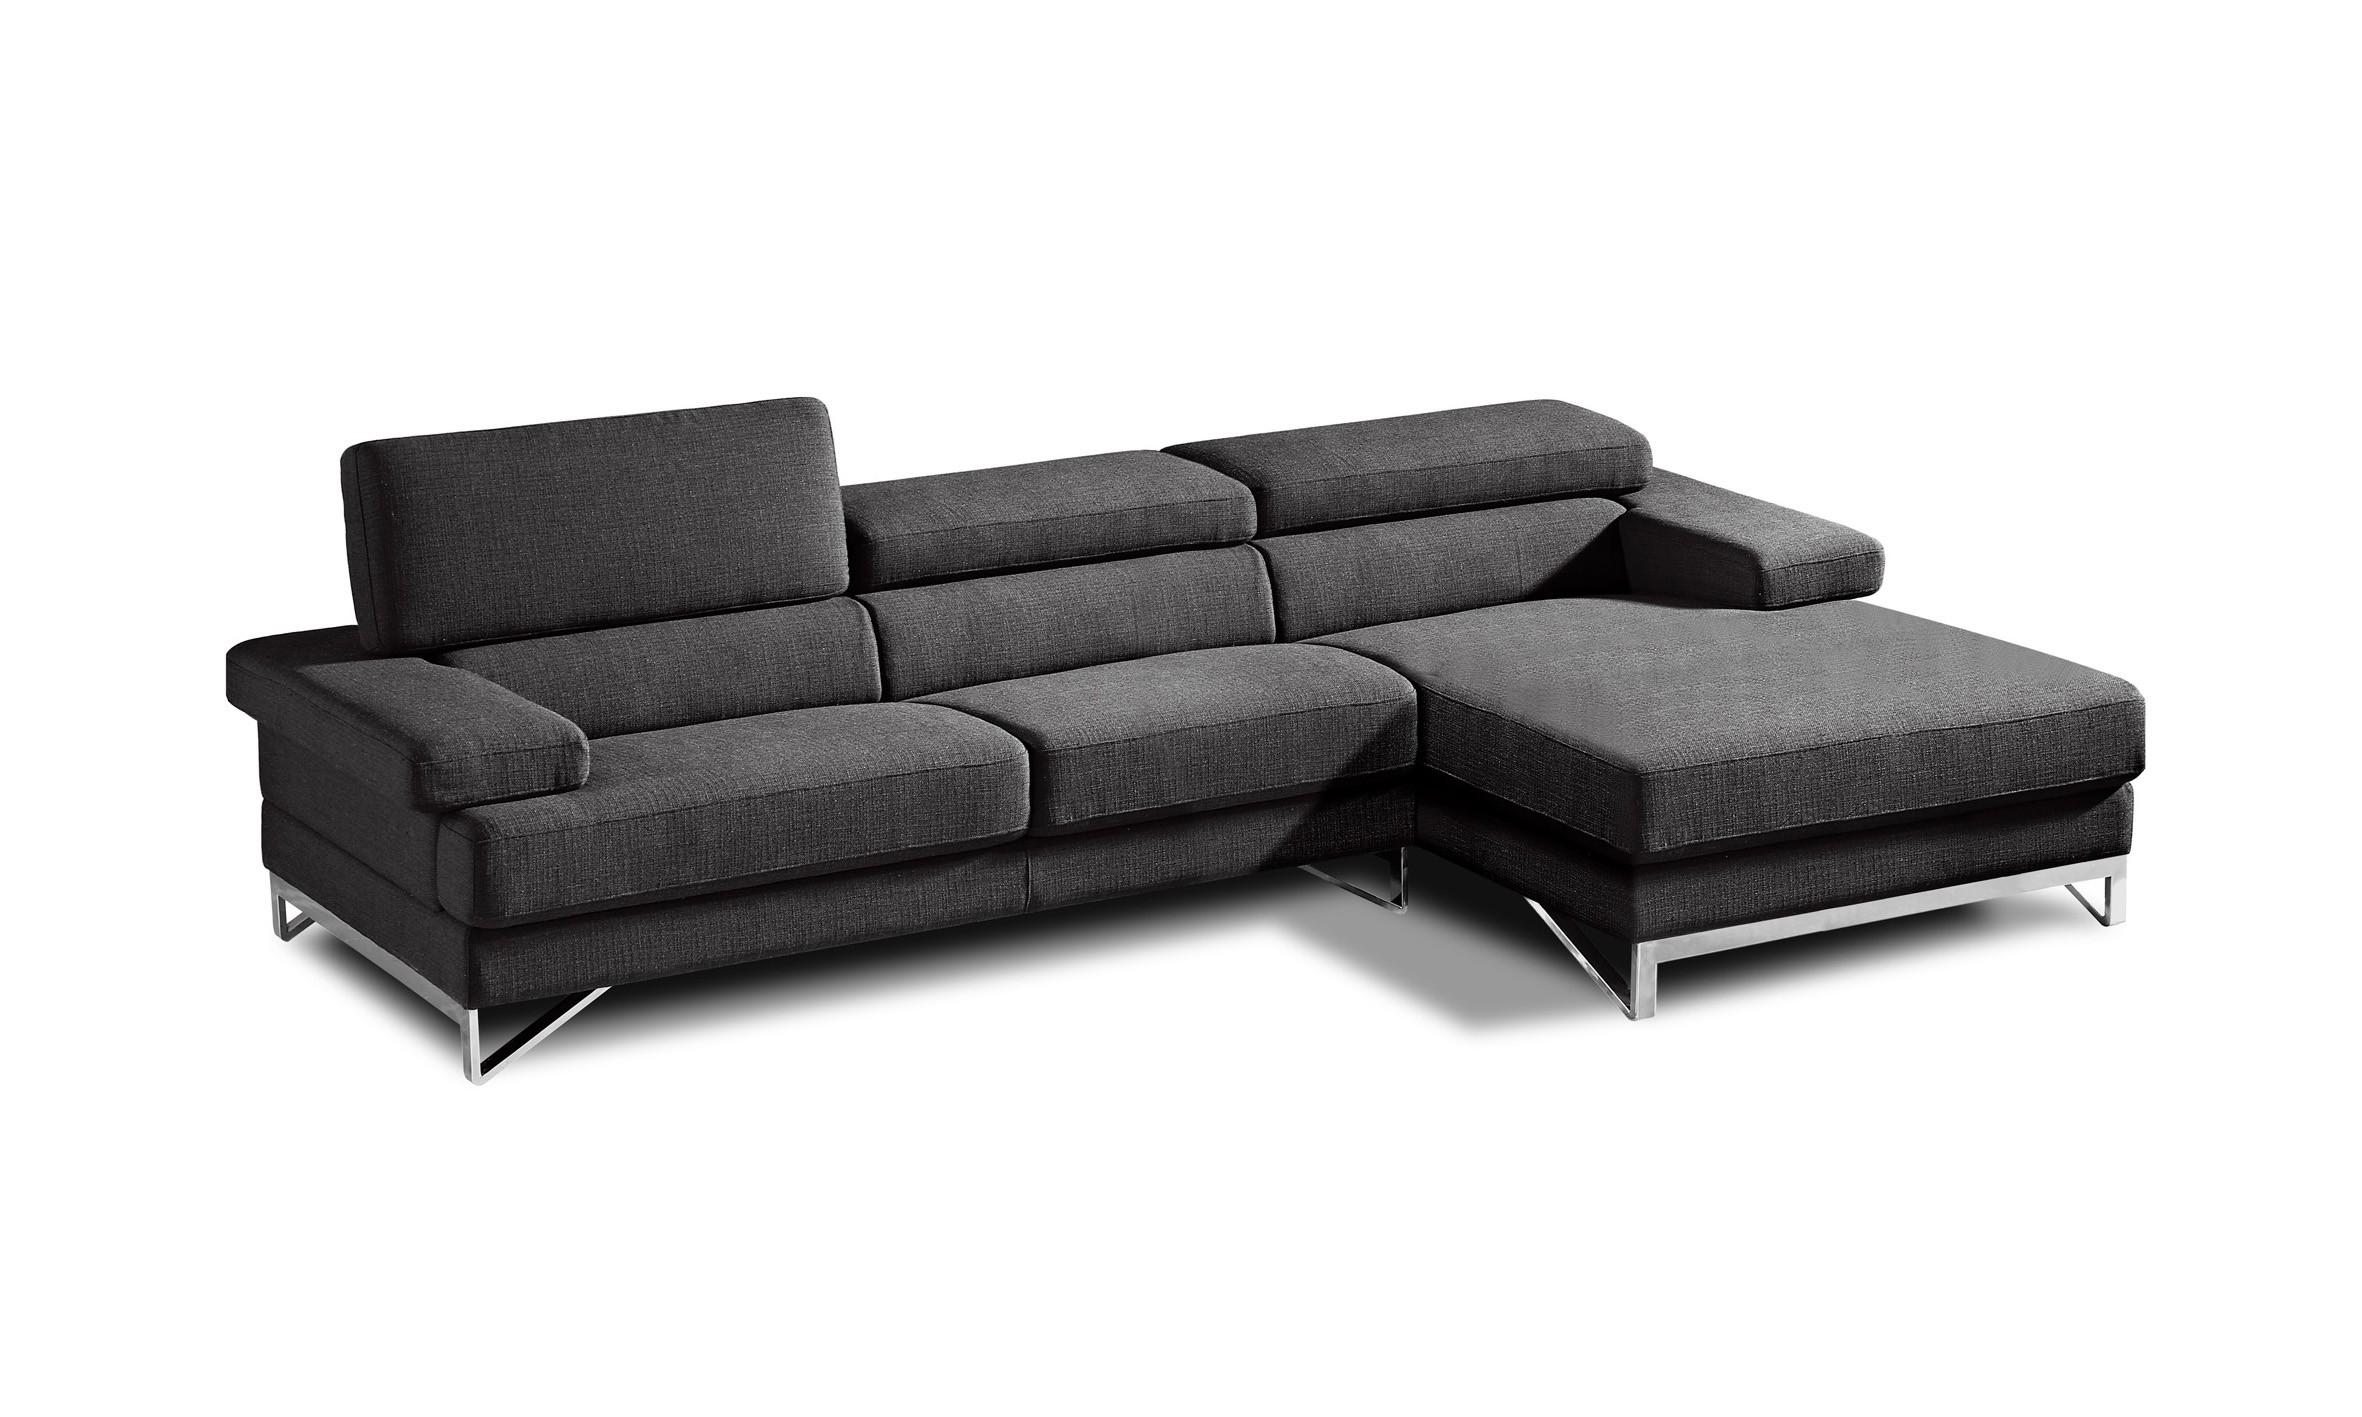 Modern Grey Fabric Sectional Sofa